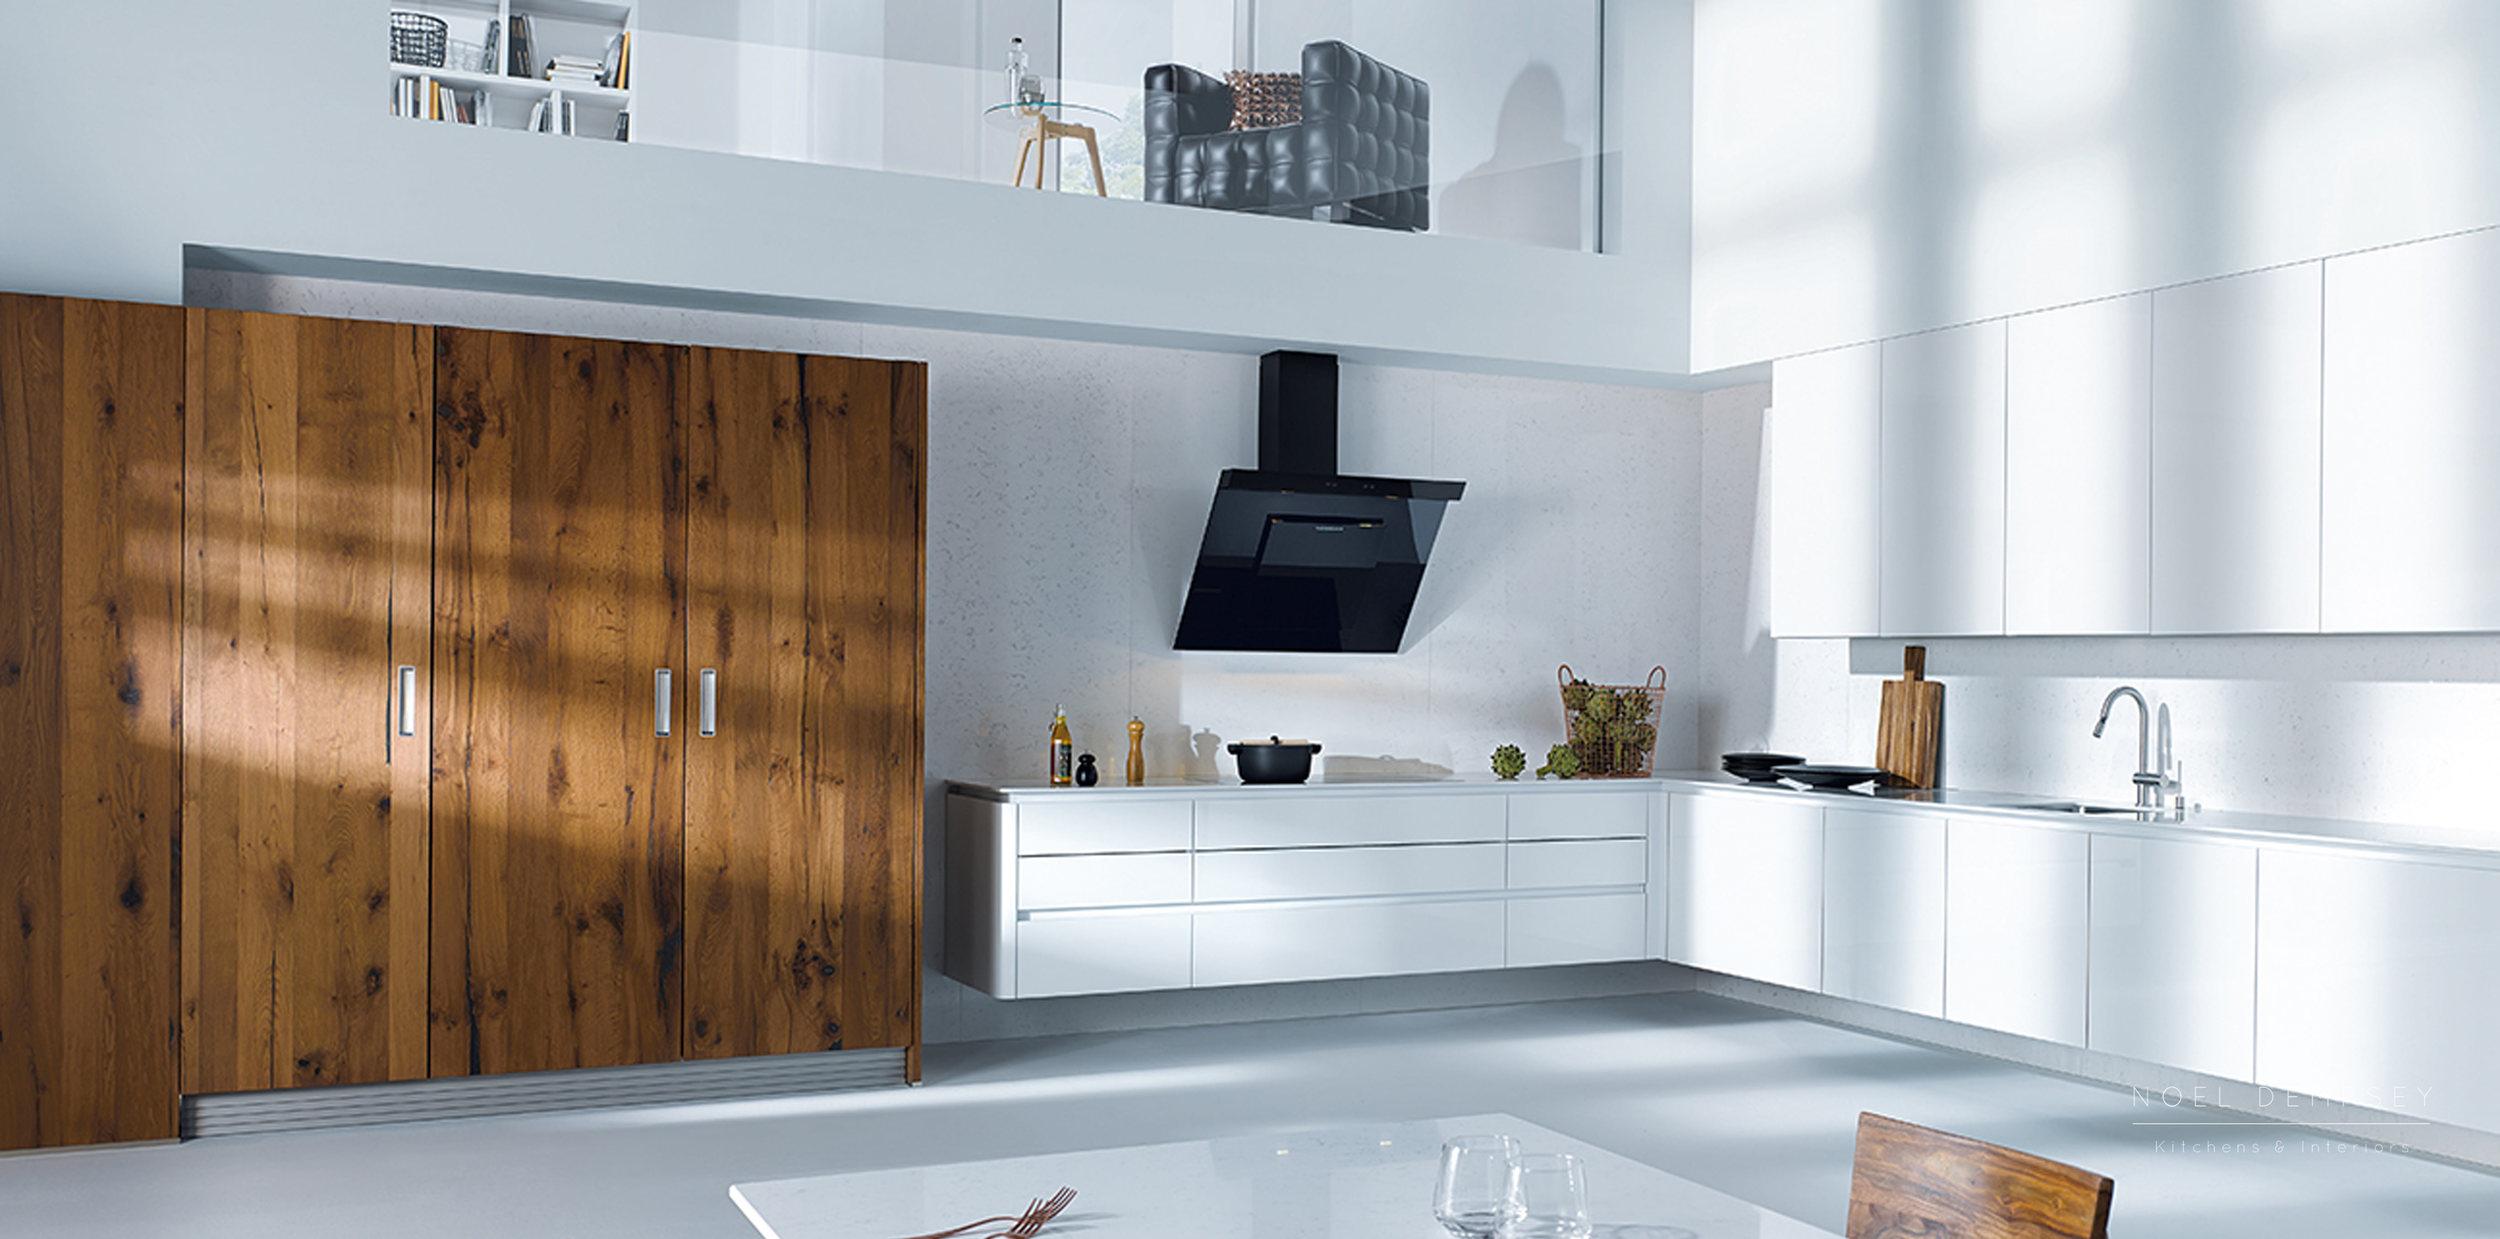 NX501-Crystal-White-Gloss-German-Kitchen-1.jpg